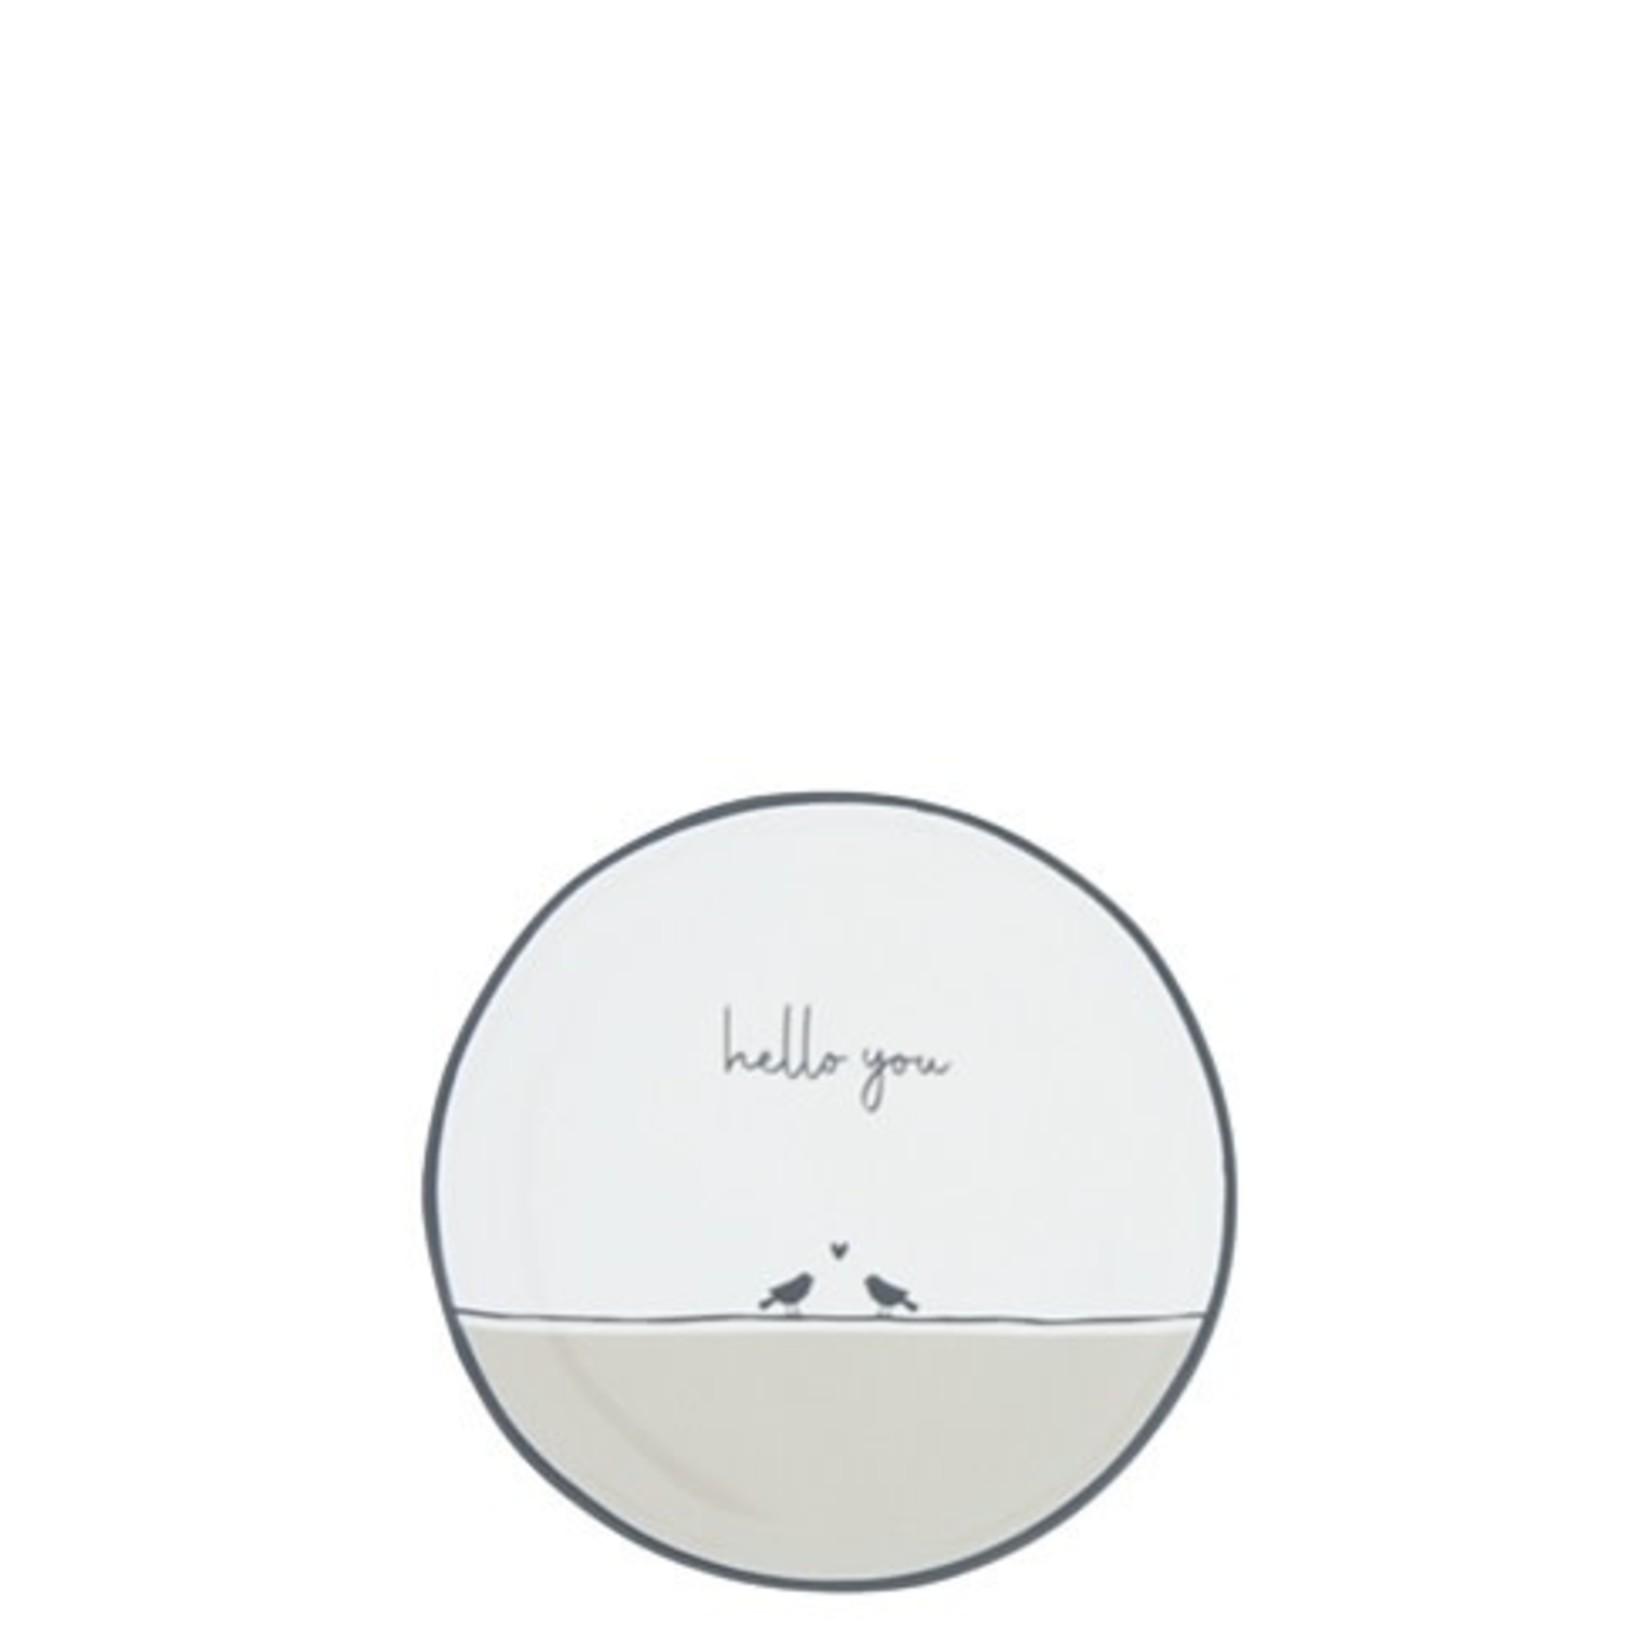 Bastion Collections Tea Tip Hello You / birds white/black/sand